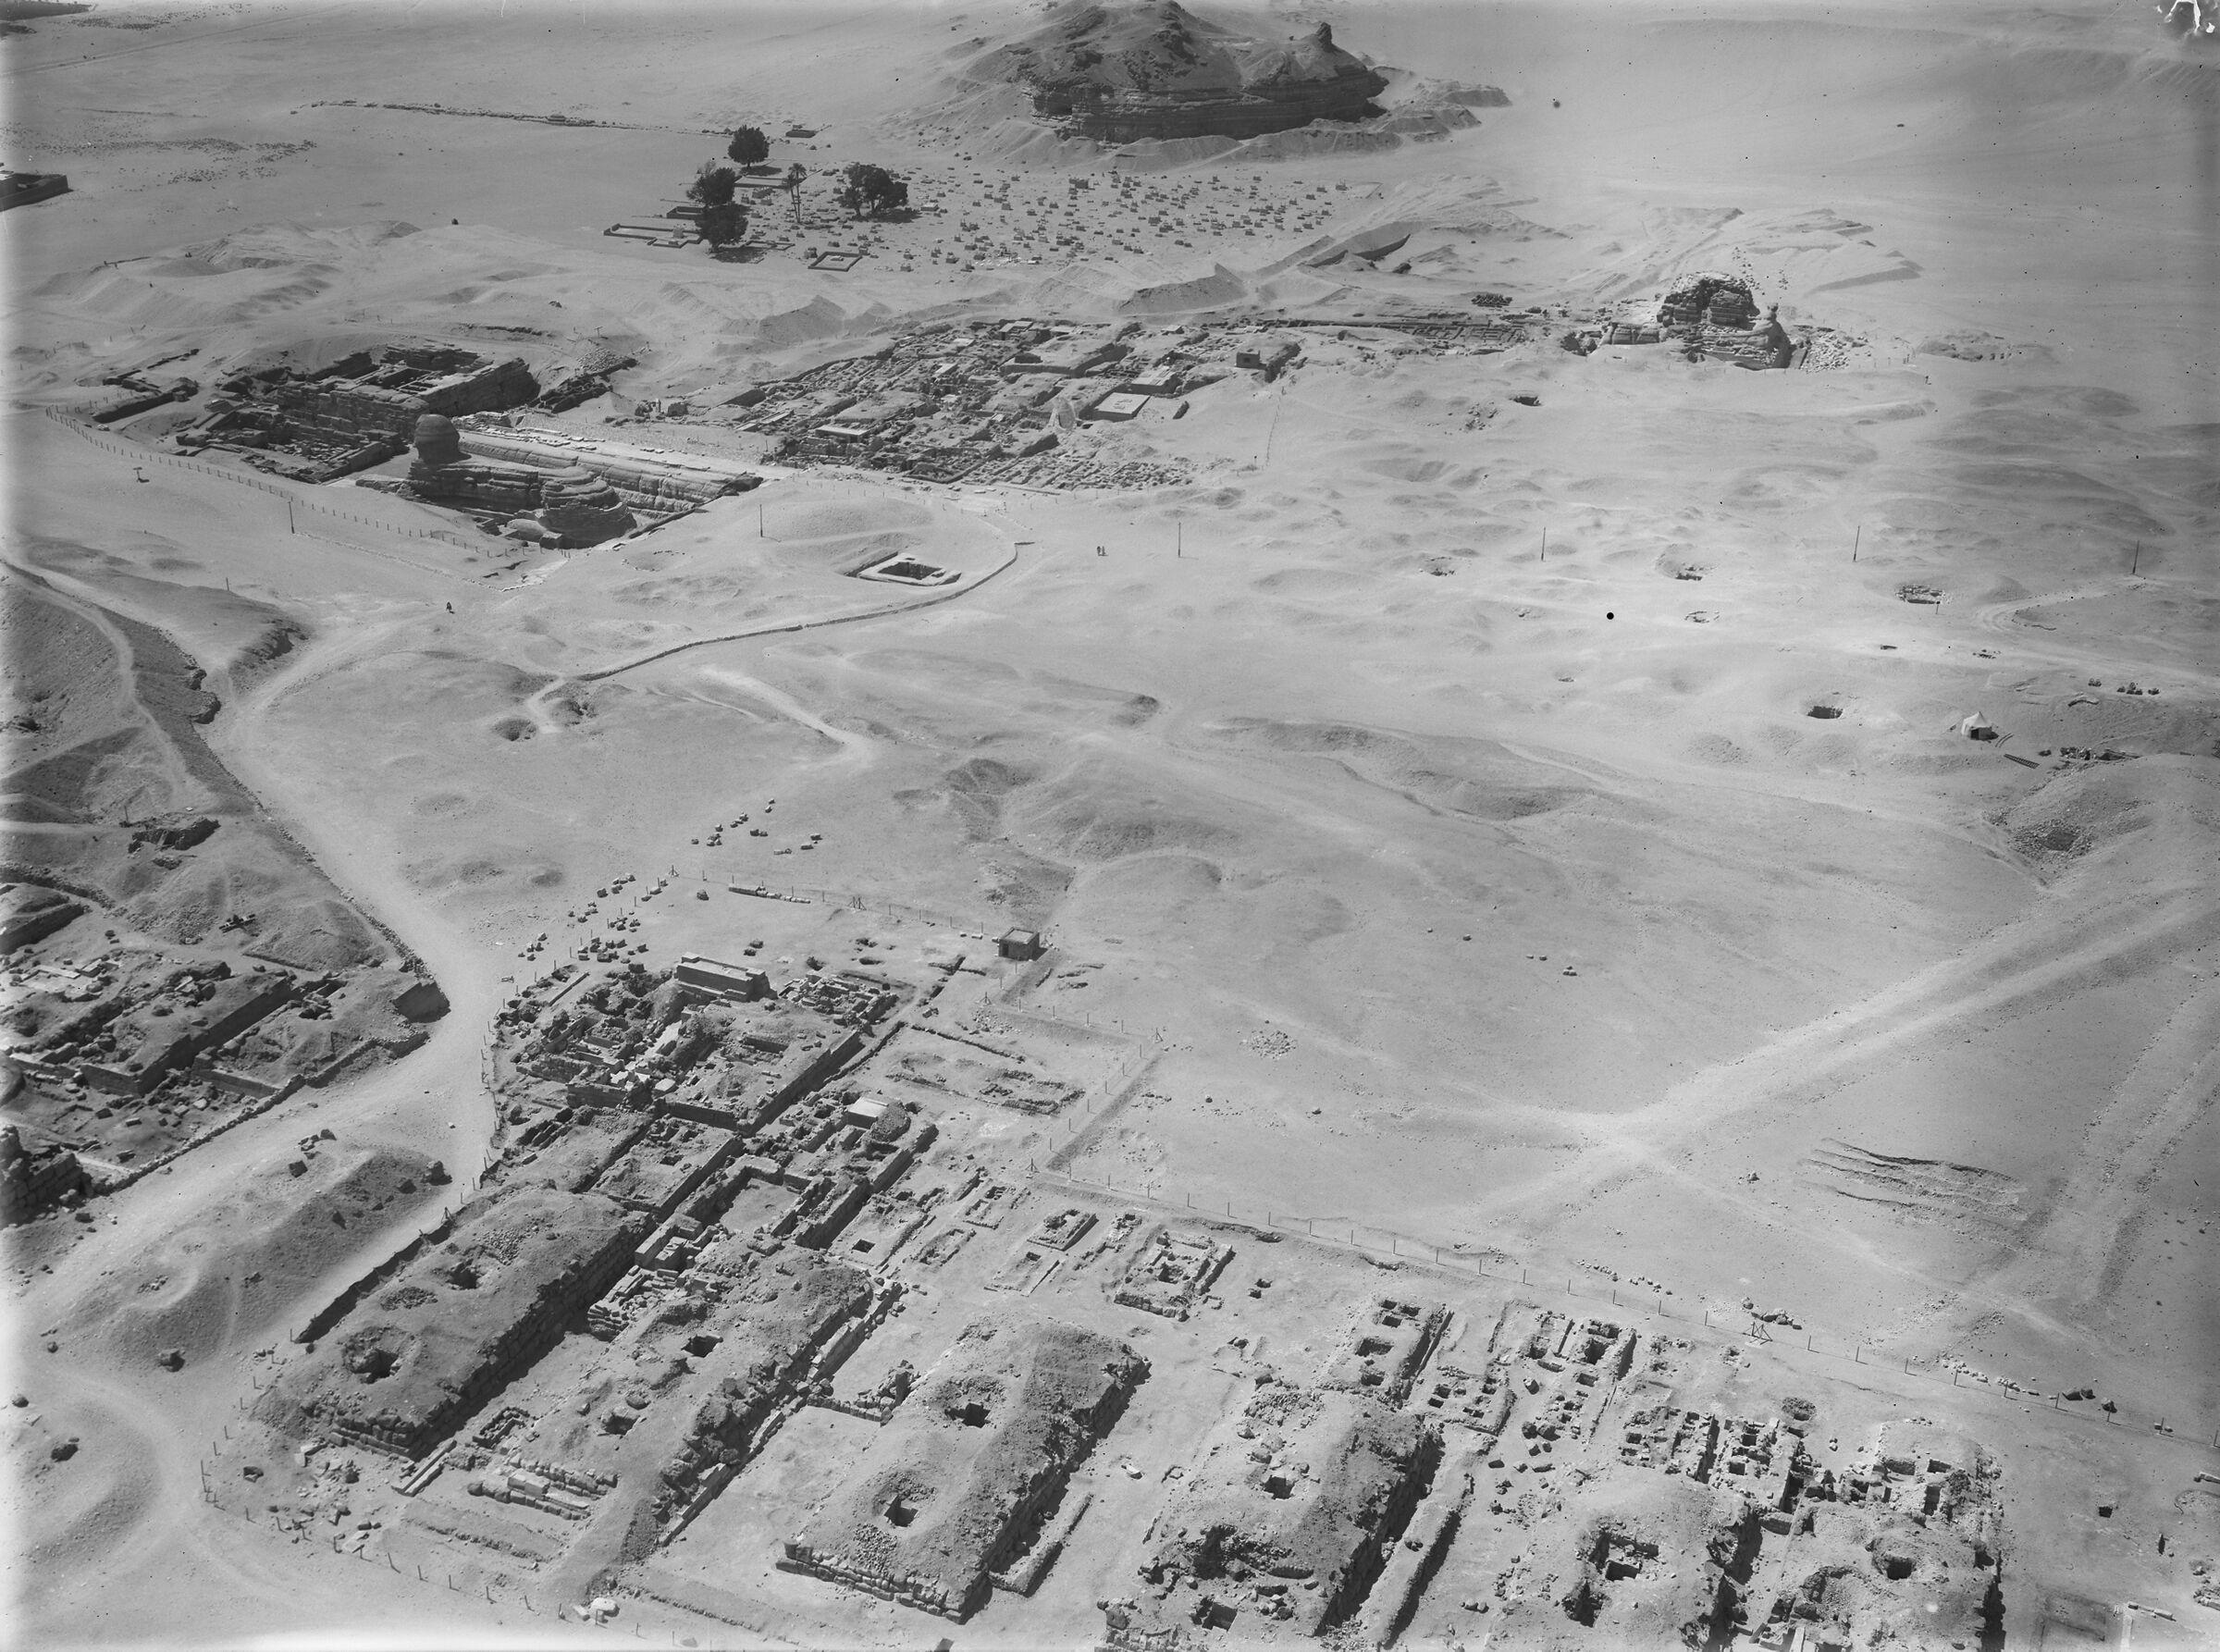 G I-South Cemetery: Site: Giza; View: Mastaba, VI, Mastaba VII, Mastaba VIII, Mastaba IX, Mastaba X, Nisusankh, Nisuhenu, Sehetepu Tepu, Heneni, Khenut, Lepsius 53, Lepsius 54, Lepsius 55, Seshemnefer-tjeti, Ptahhetep